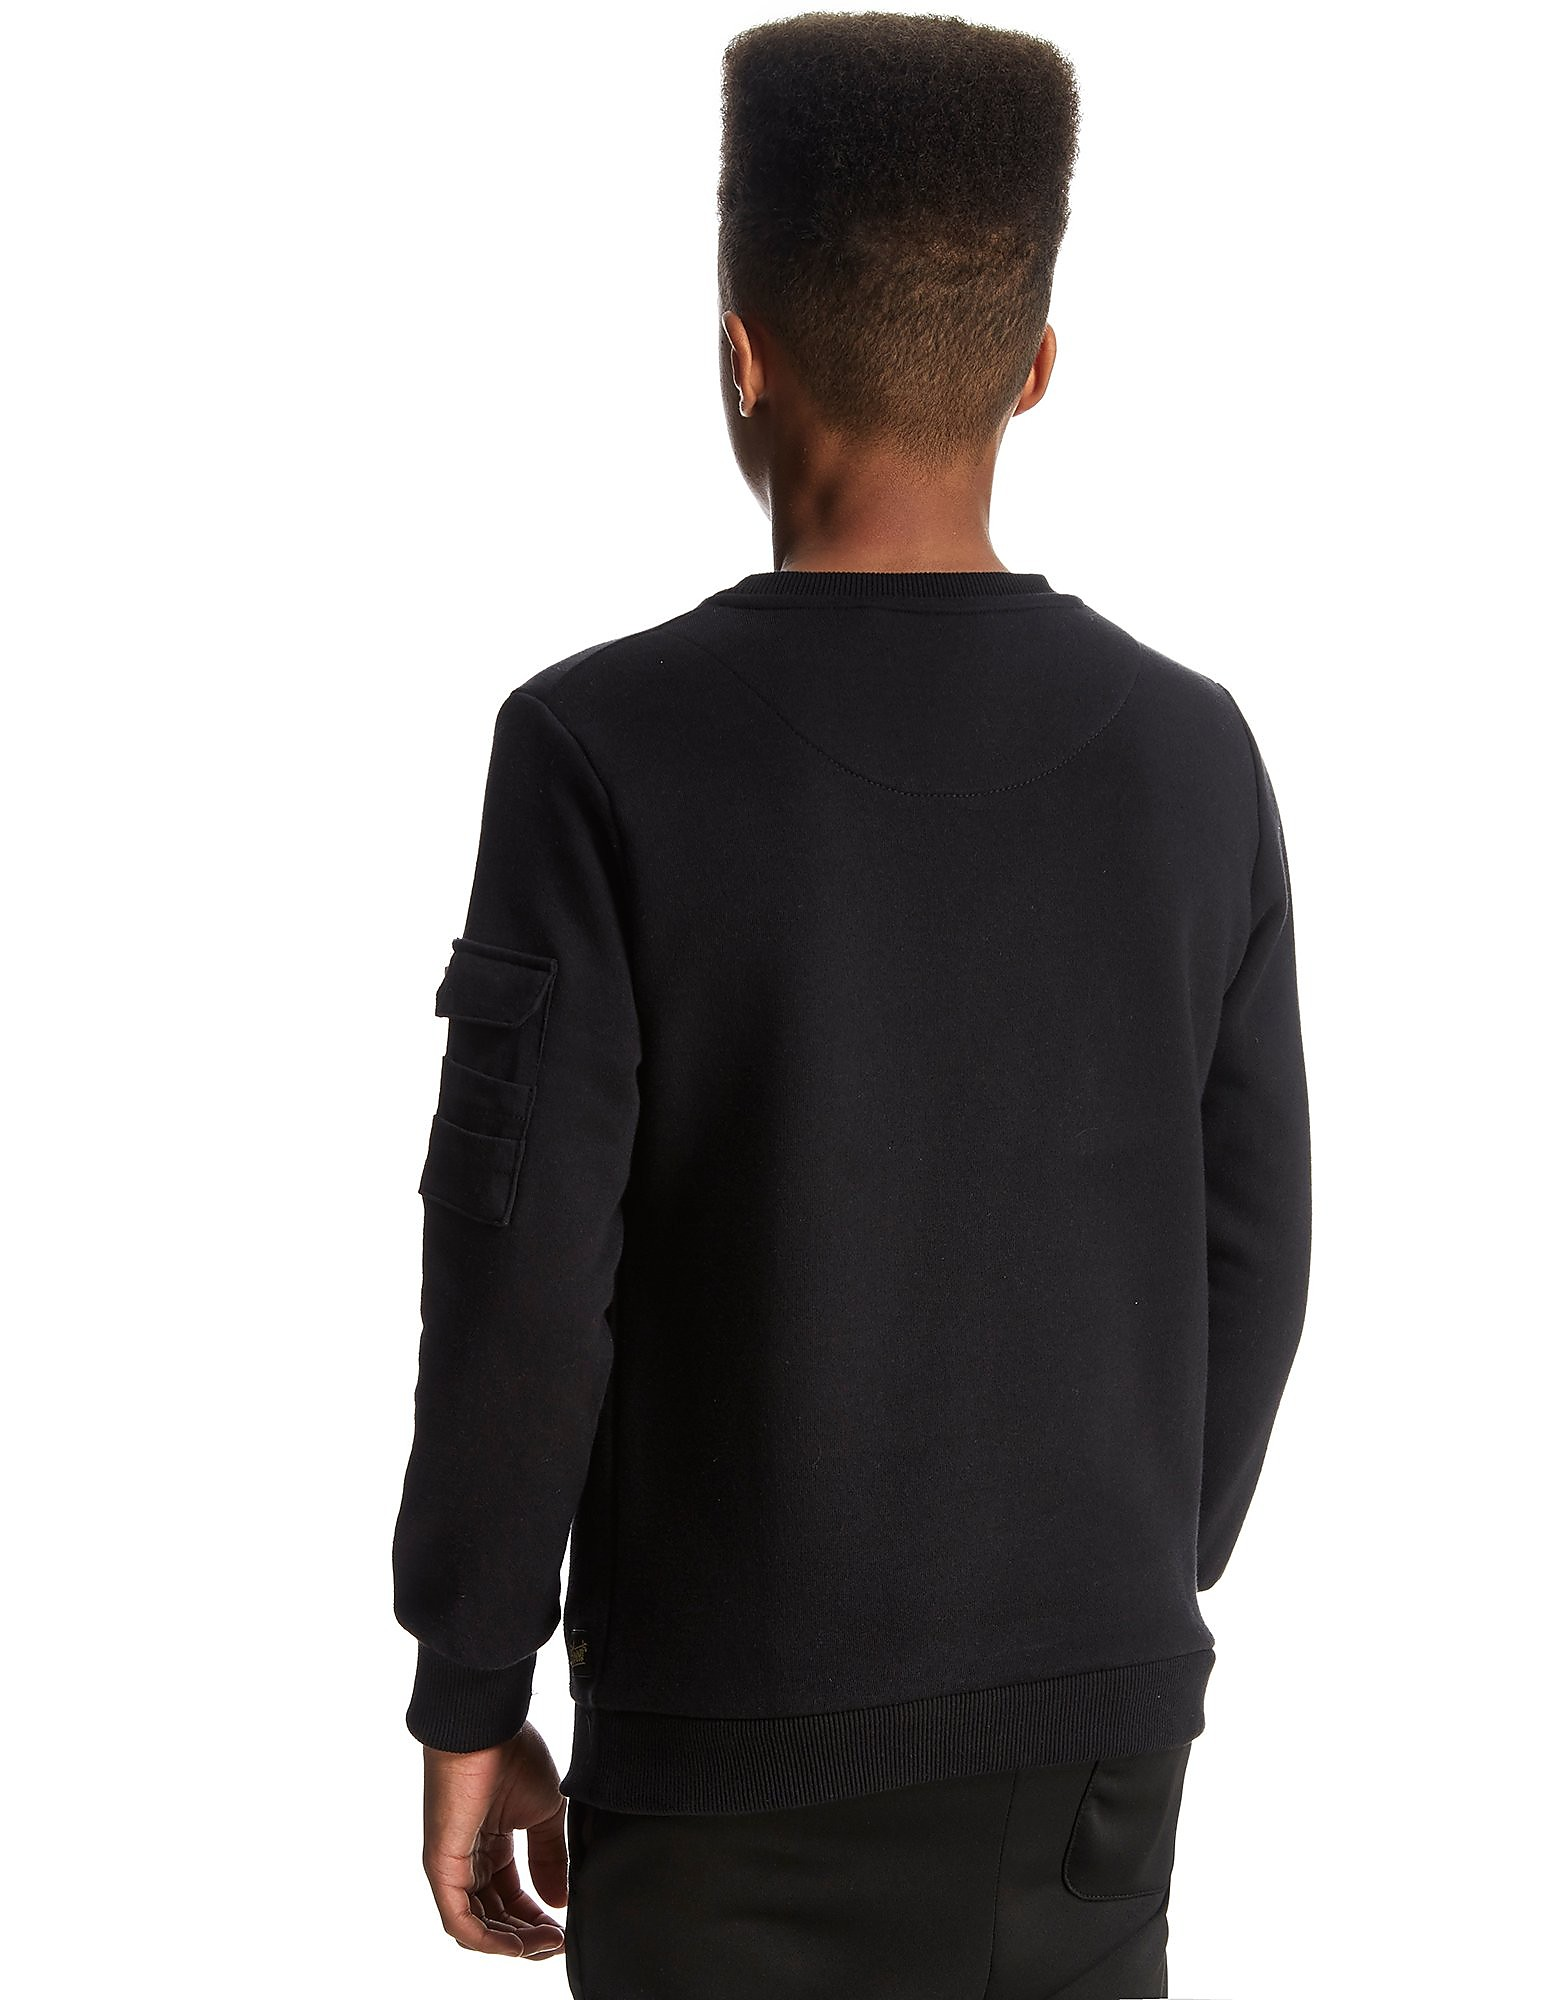 Sonneti Bling Crew Sweatshirt Junior